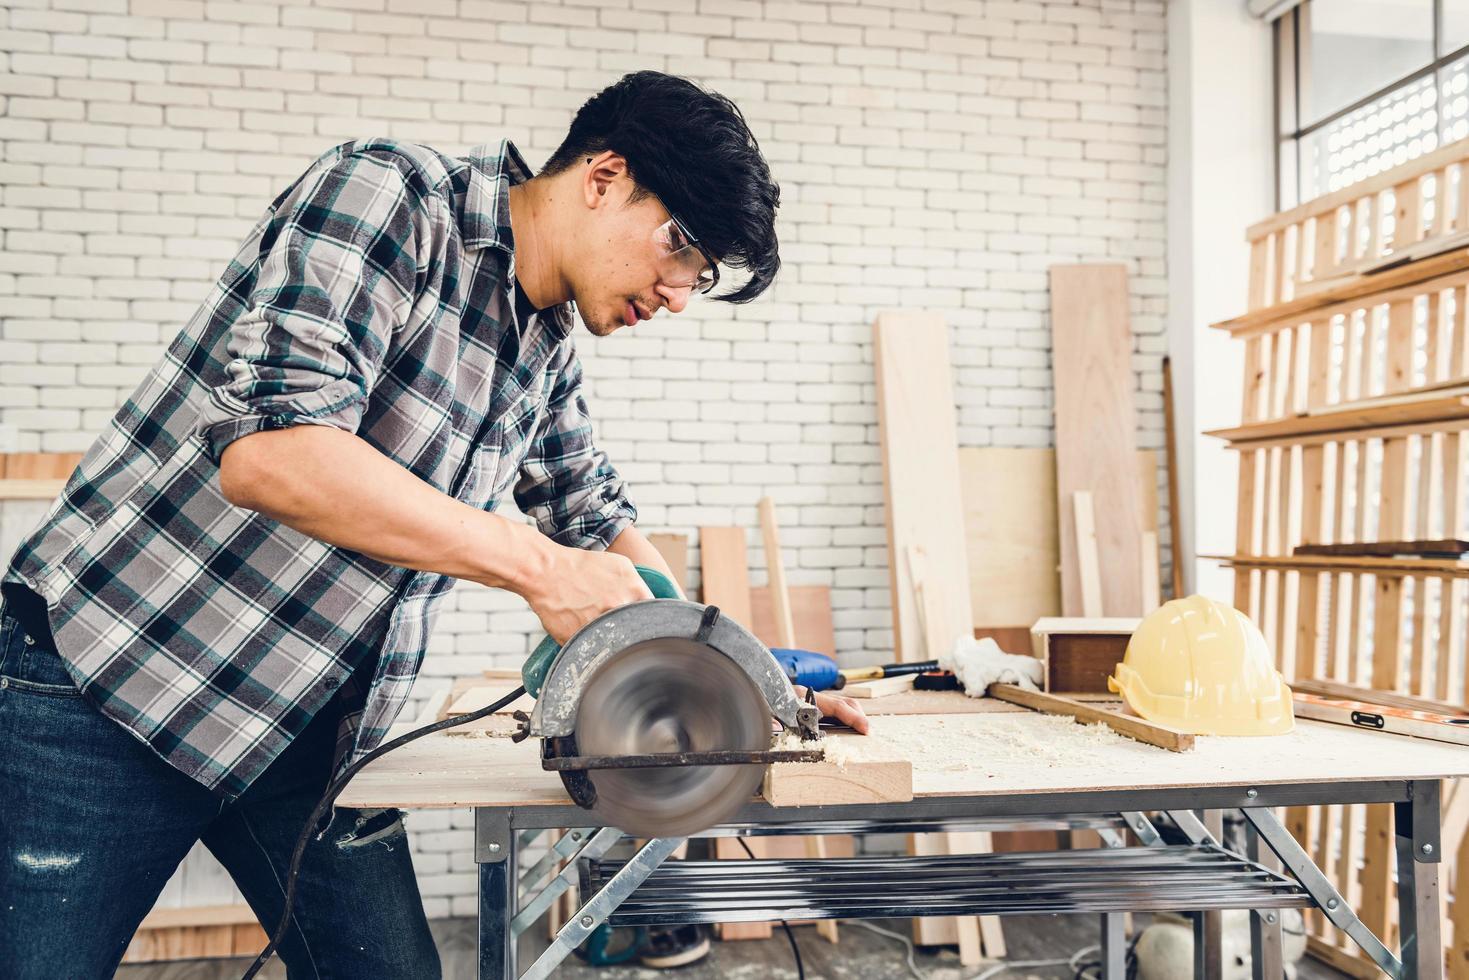 Carpenter cutting timber photo